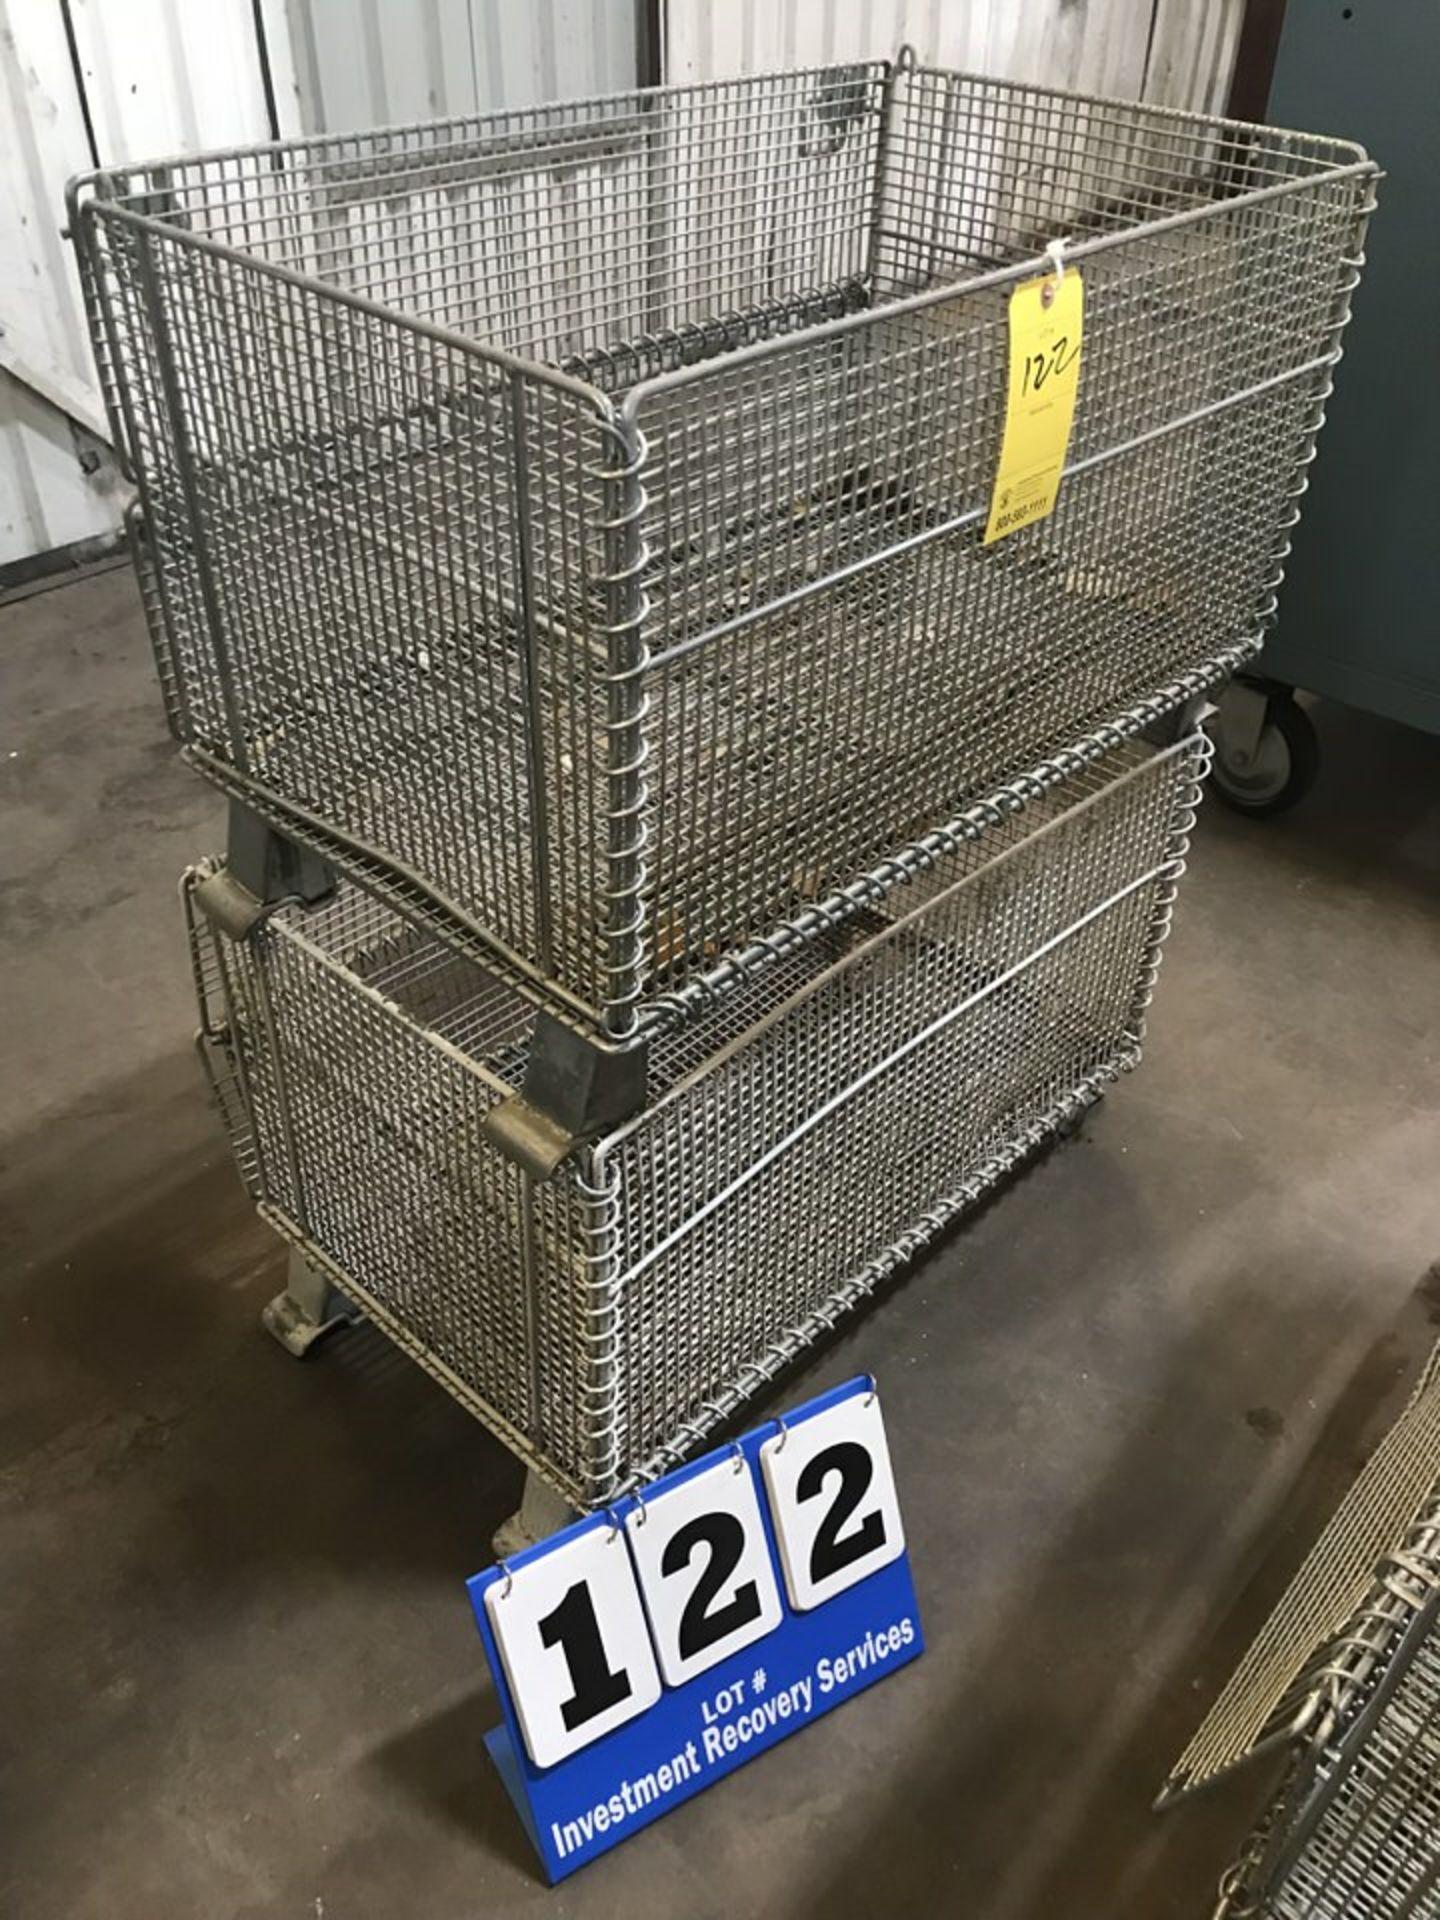 Lot 122 - (2) Shop Baskets (LOCATION: 3421 N SYLVANIA, FT WORTH, TX, 76111)